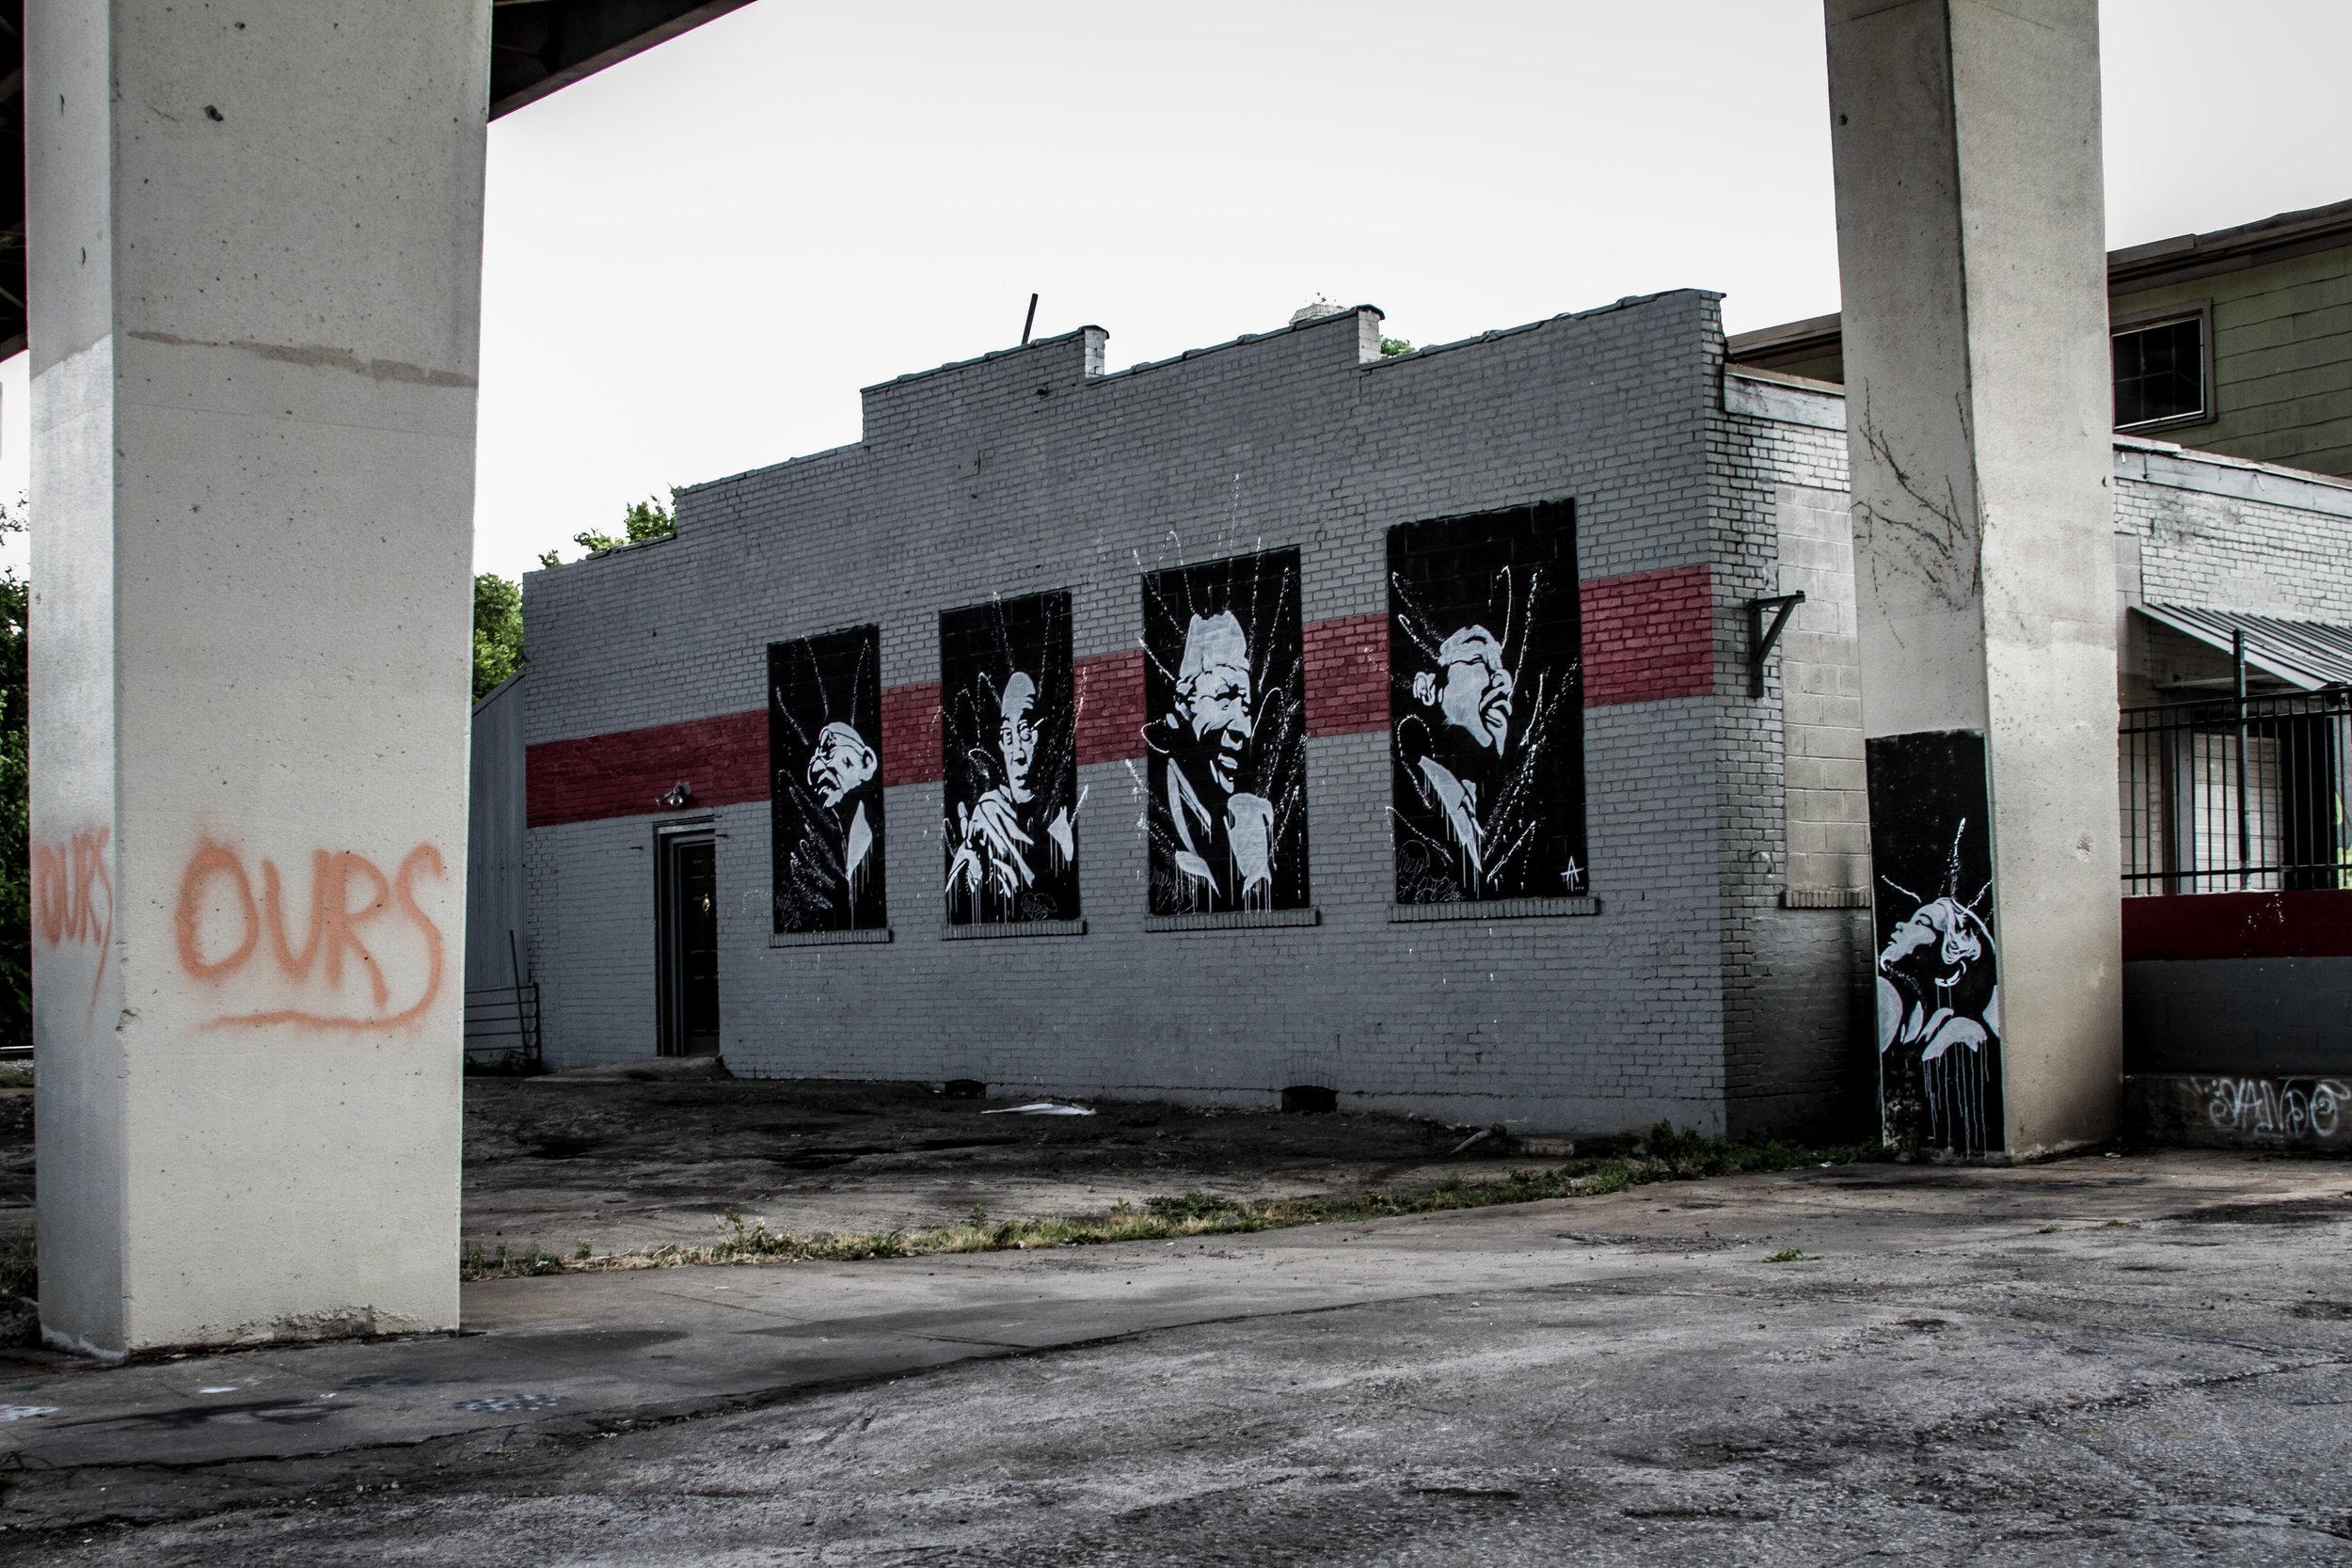 Mural by Thaxton Abshalom Waters underneath Jubilee Bridge in Nashville, TN